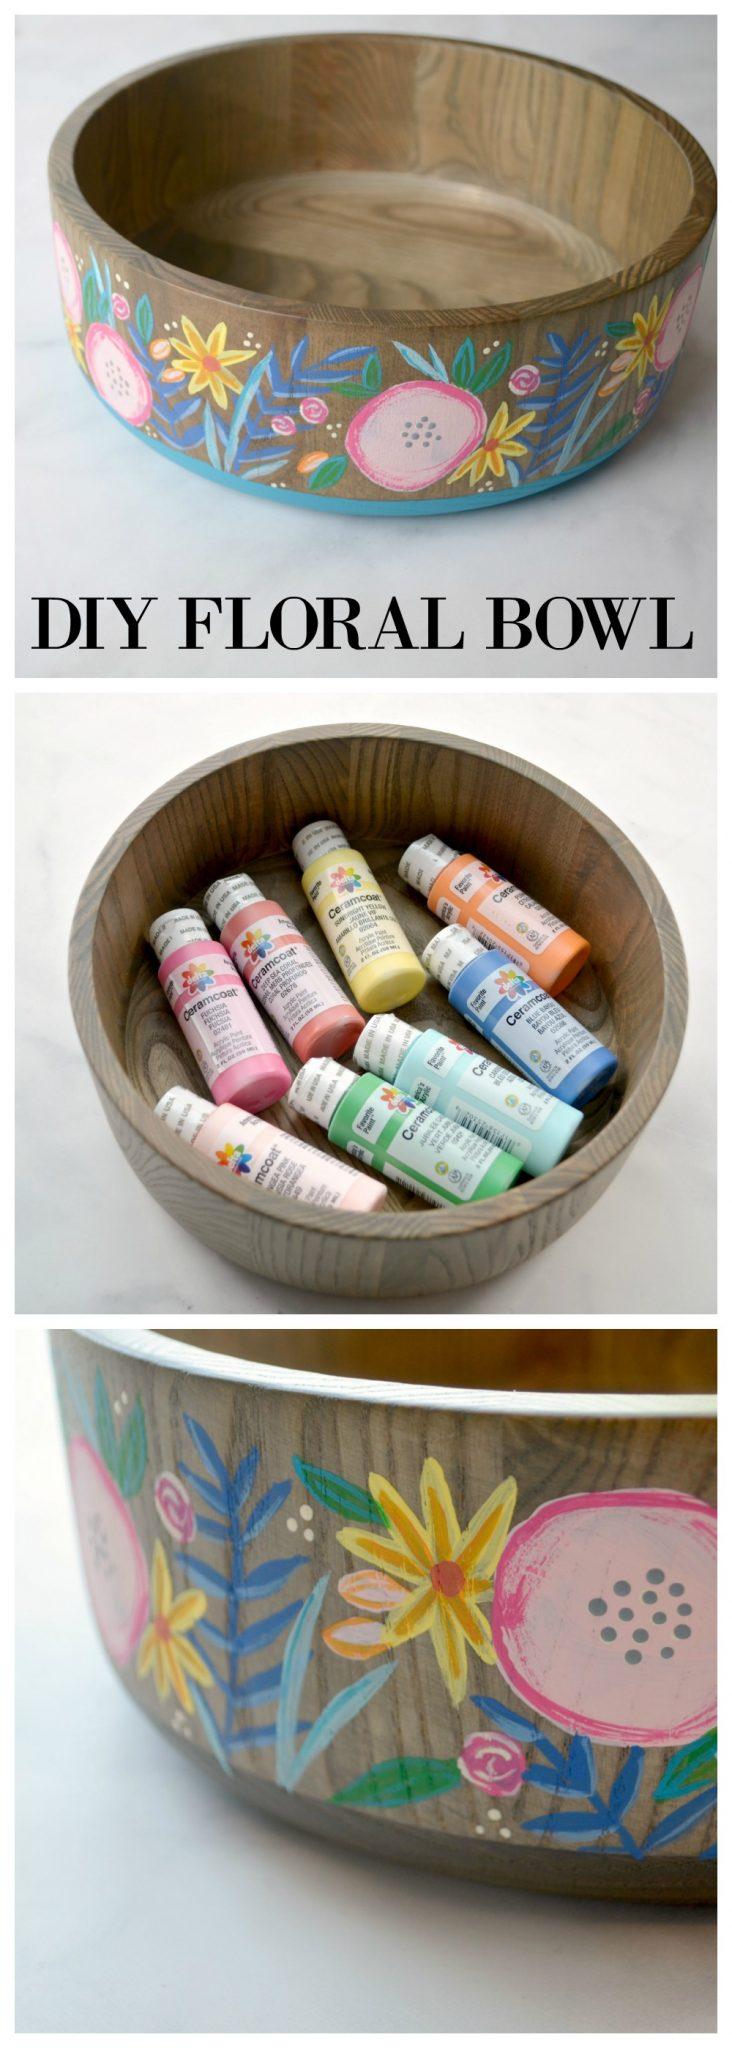 DIY Floral Bowl with Delta Paint